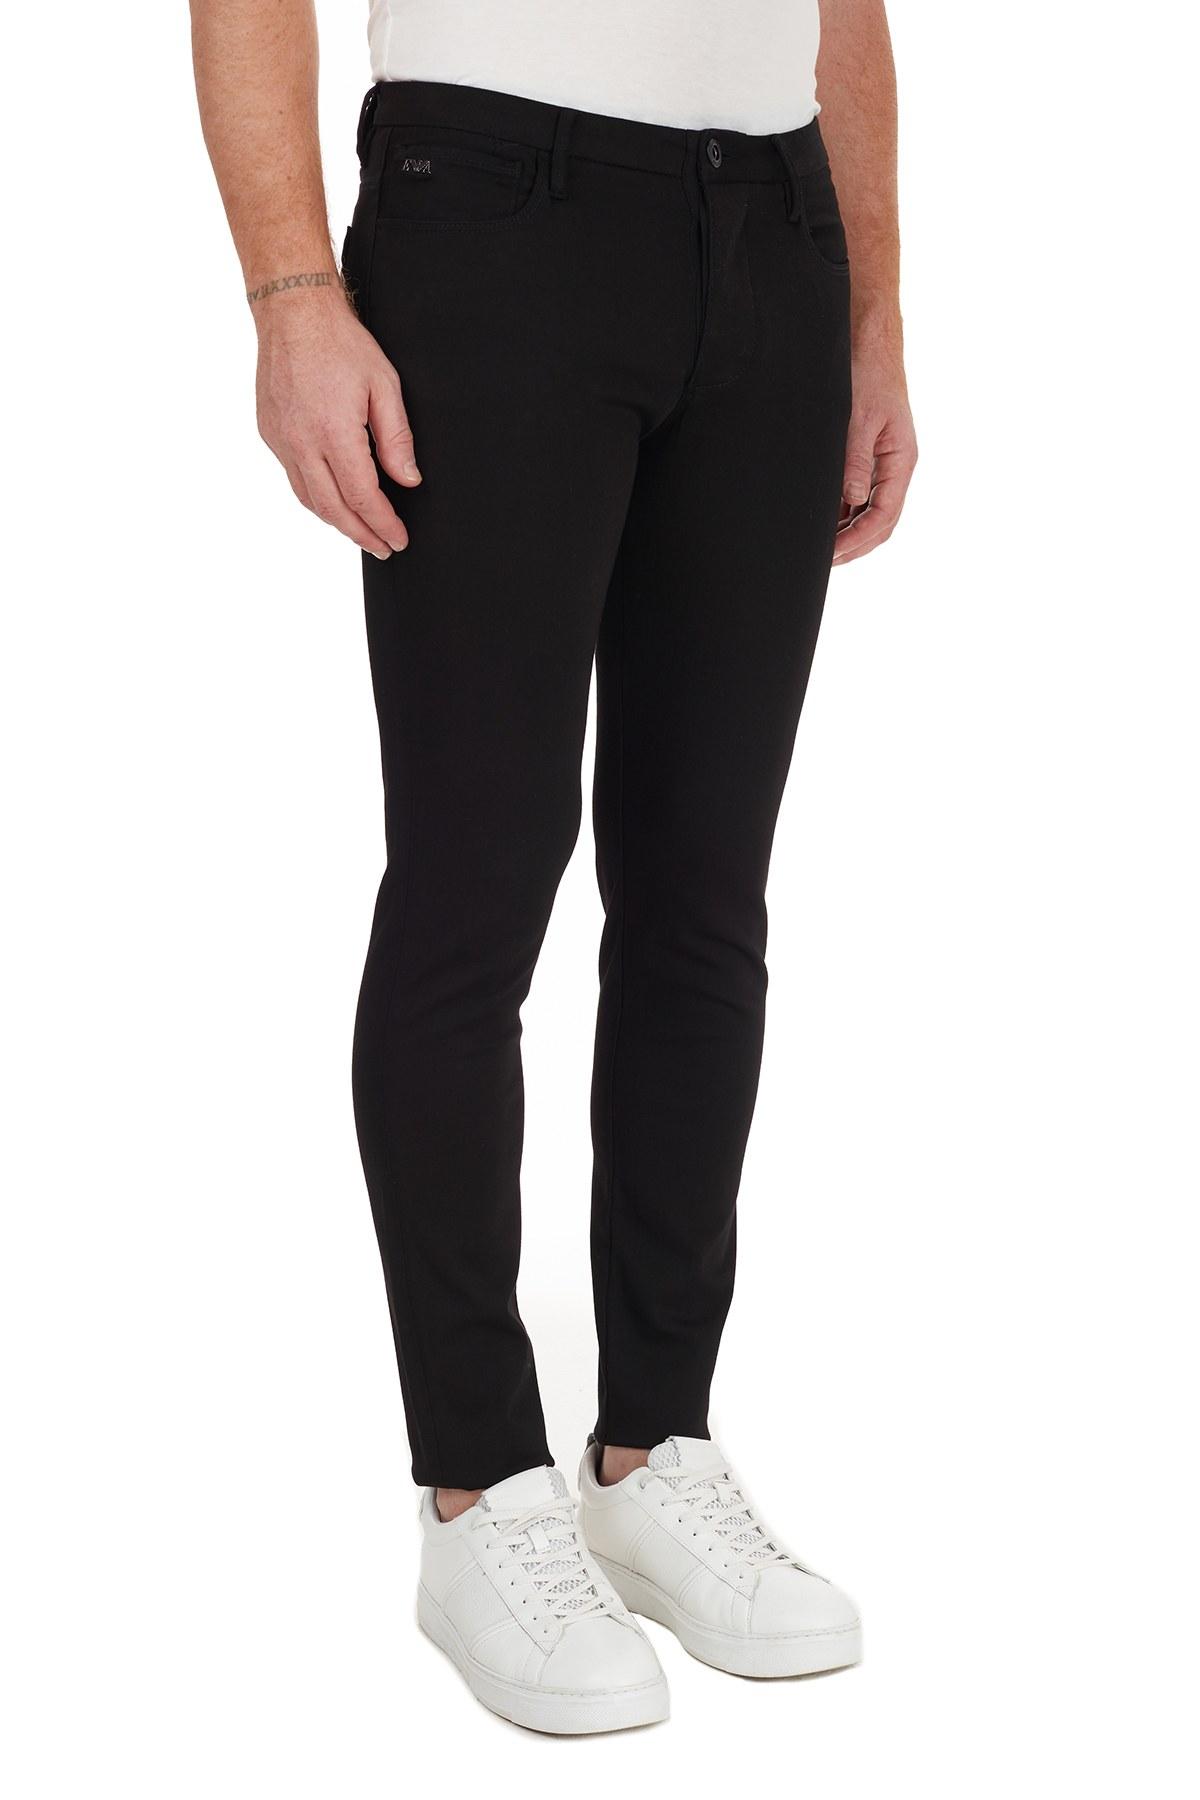 Emporio Armani Pamuklu Extra Slim Fit J11 Jeans Erkek Kot Pantolon 6H1J11 1DHDZ 0005 SİYAH